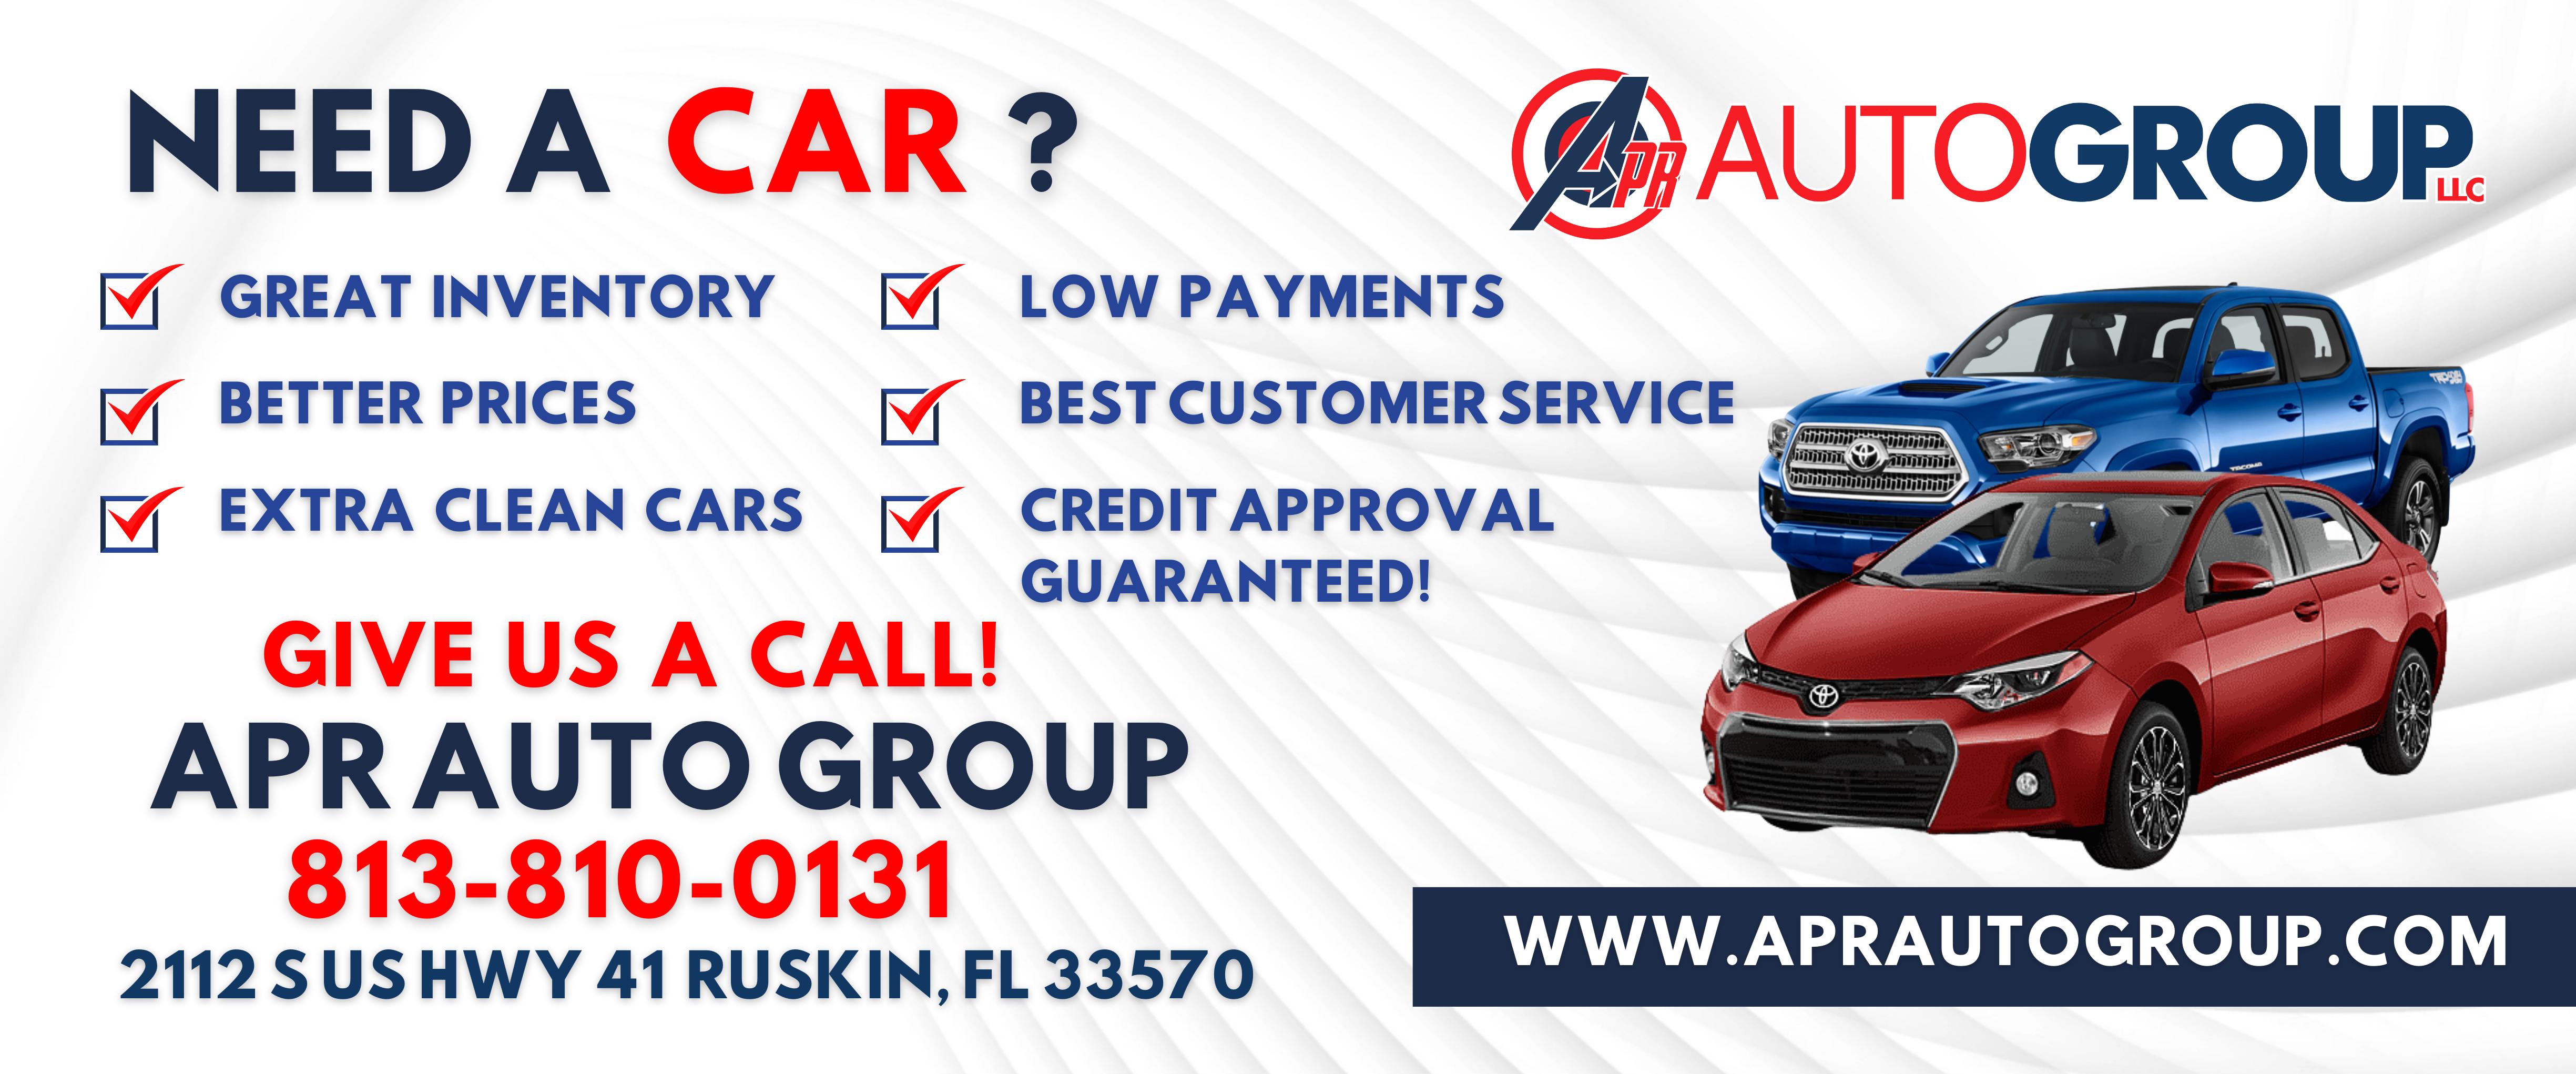 APR Auto Group LLC Reviews, Ratings | Used Car Dealers near 2112 S U.S. Hwy 41 , Ruskin FL